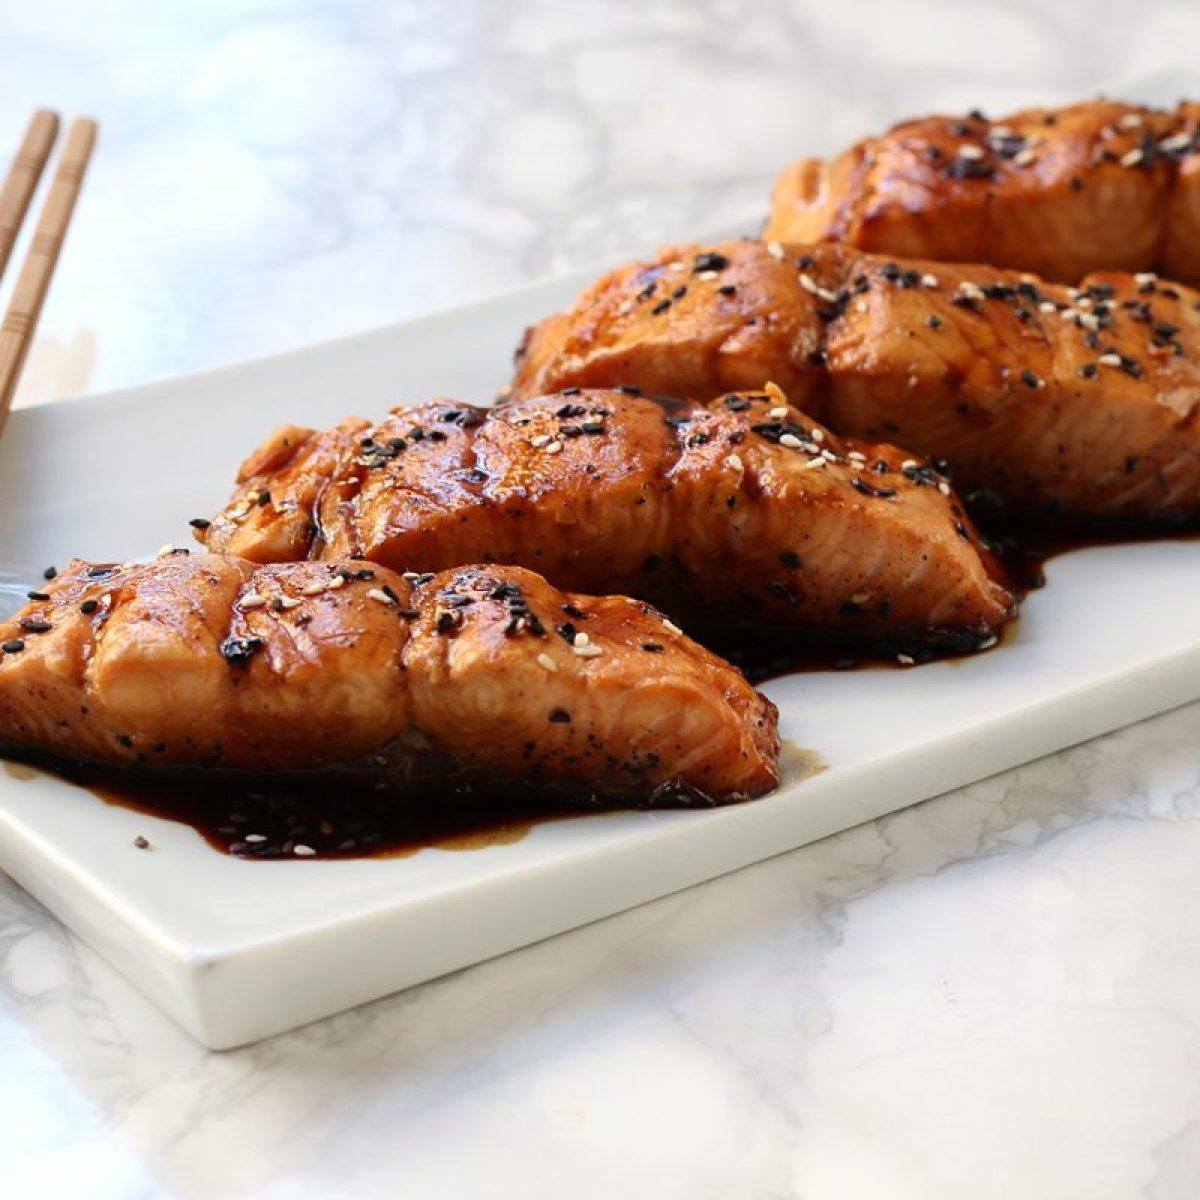 Ricetta Salmone Orientale.Salmone In Salsa Teriyaki La Ricetta Giapponese Gustosa E Veloce